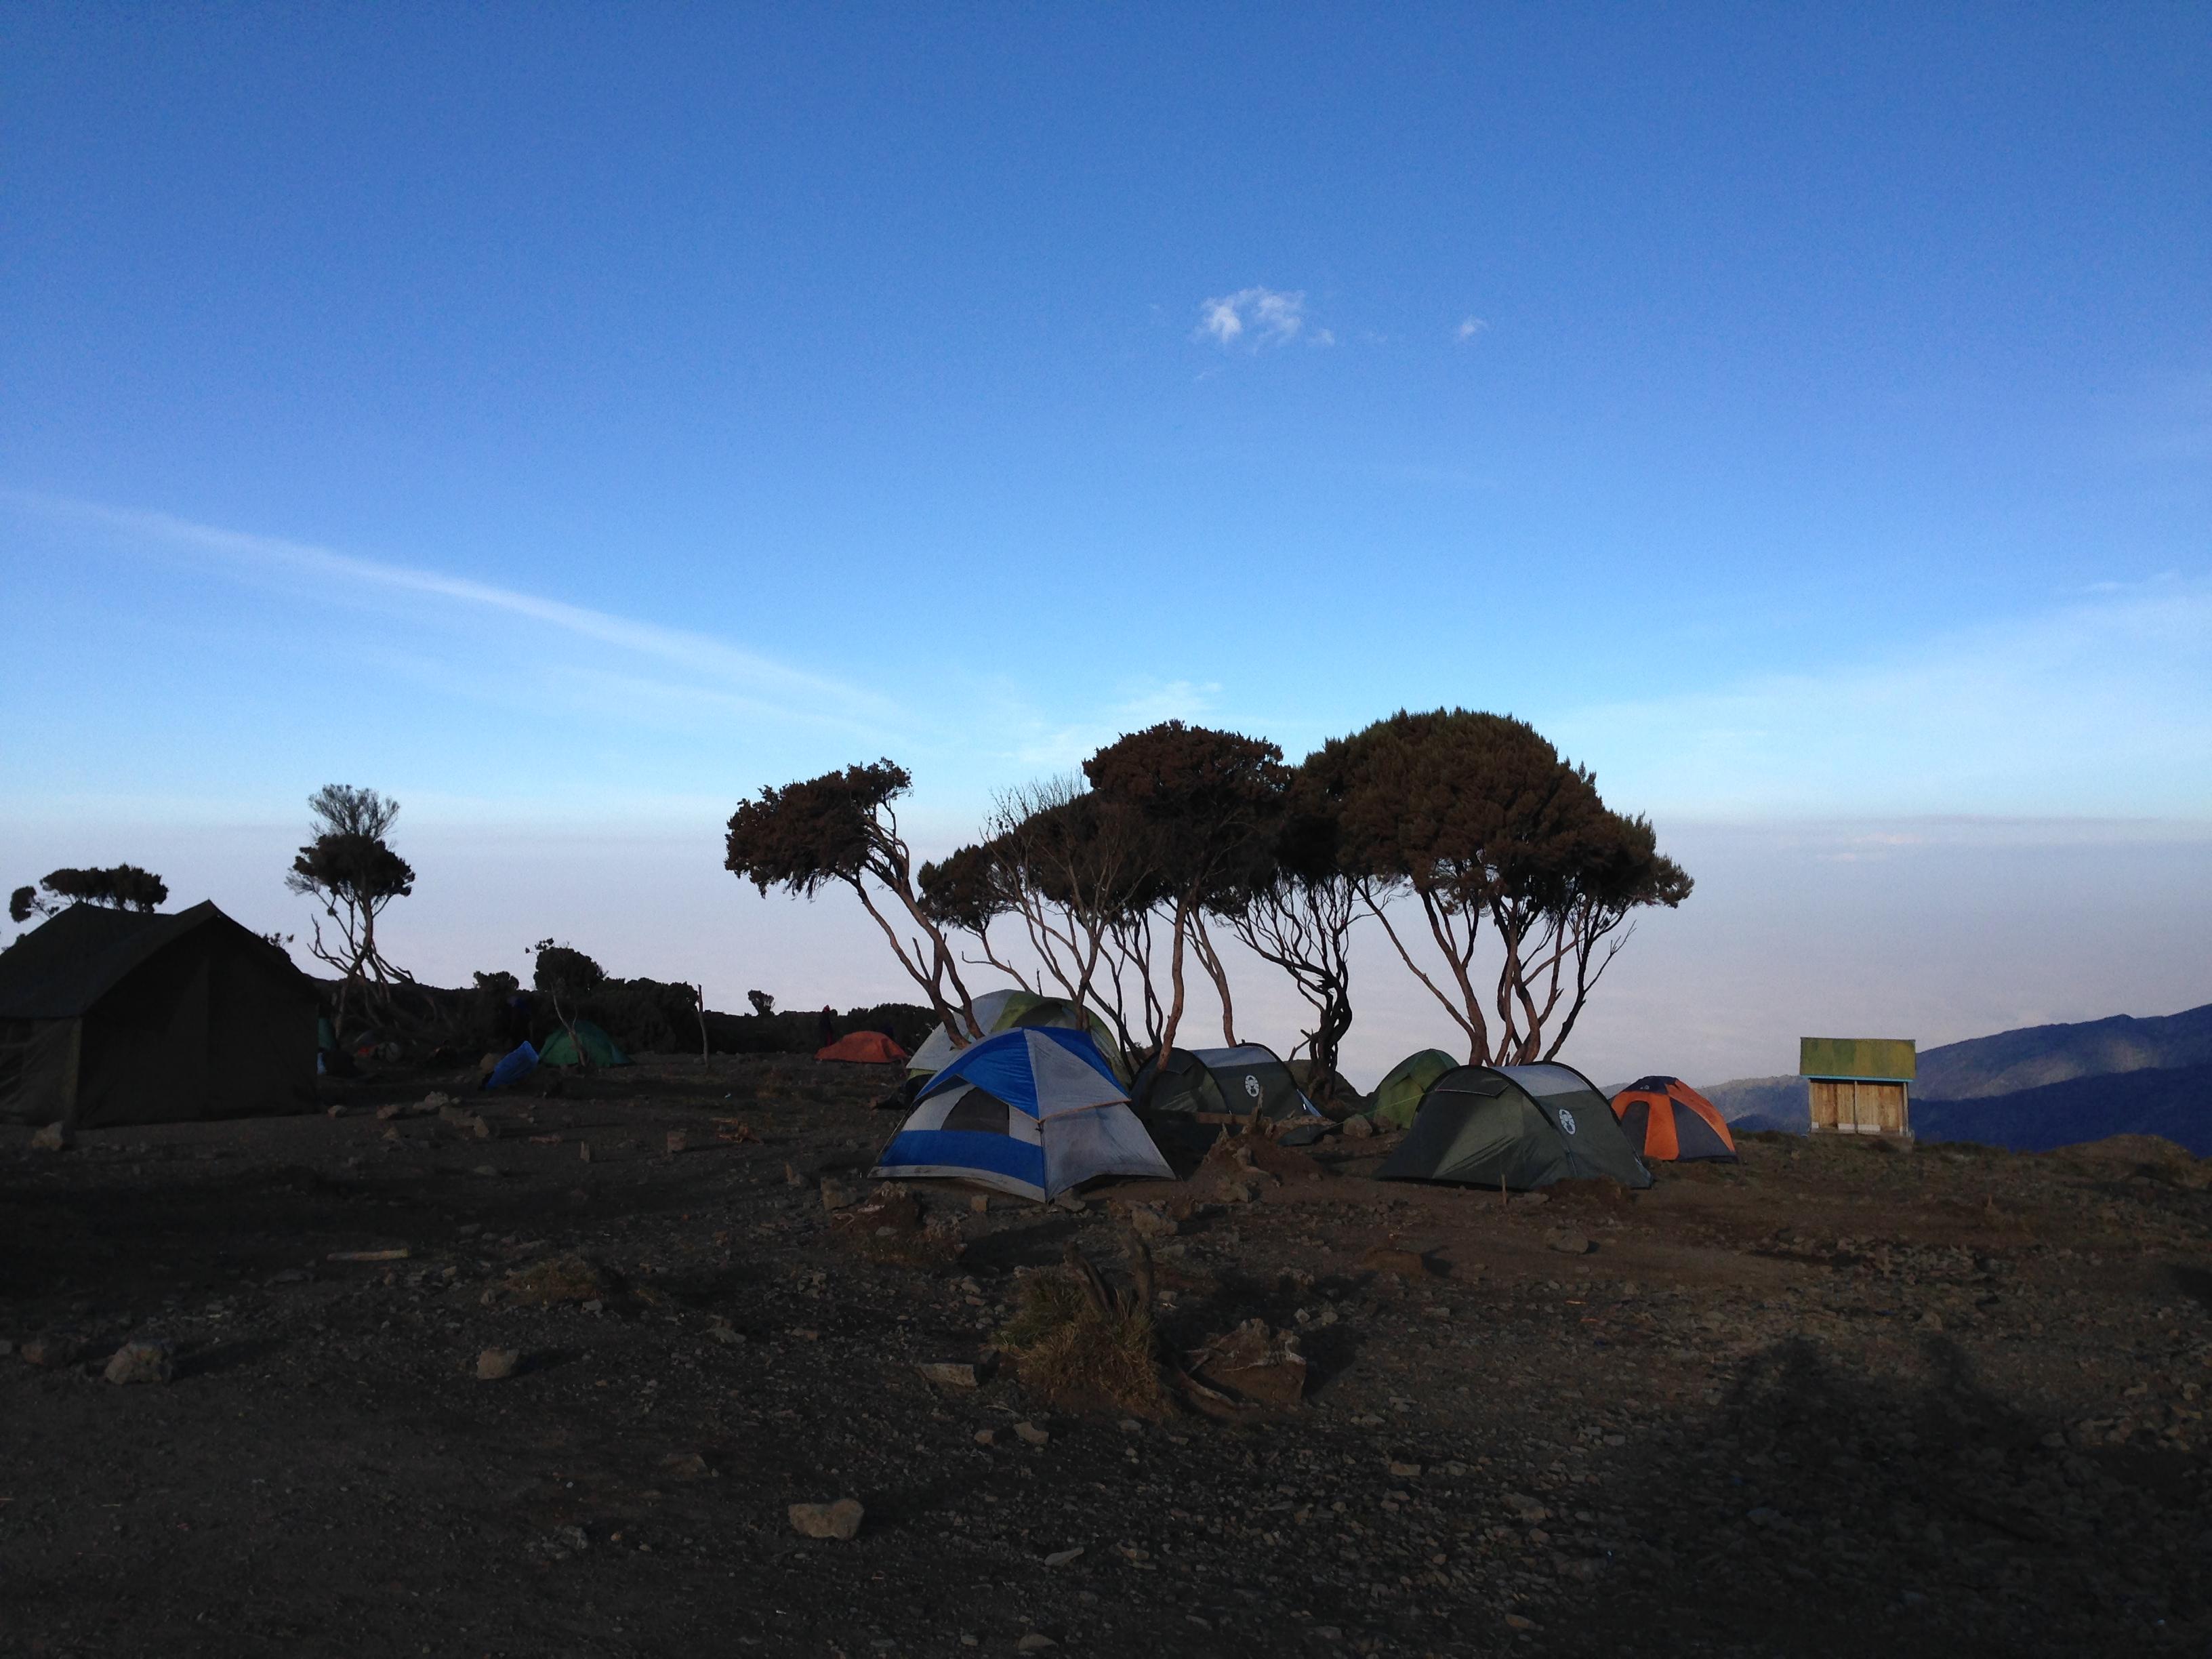 Notes on Kilimanjaro